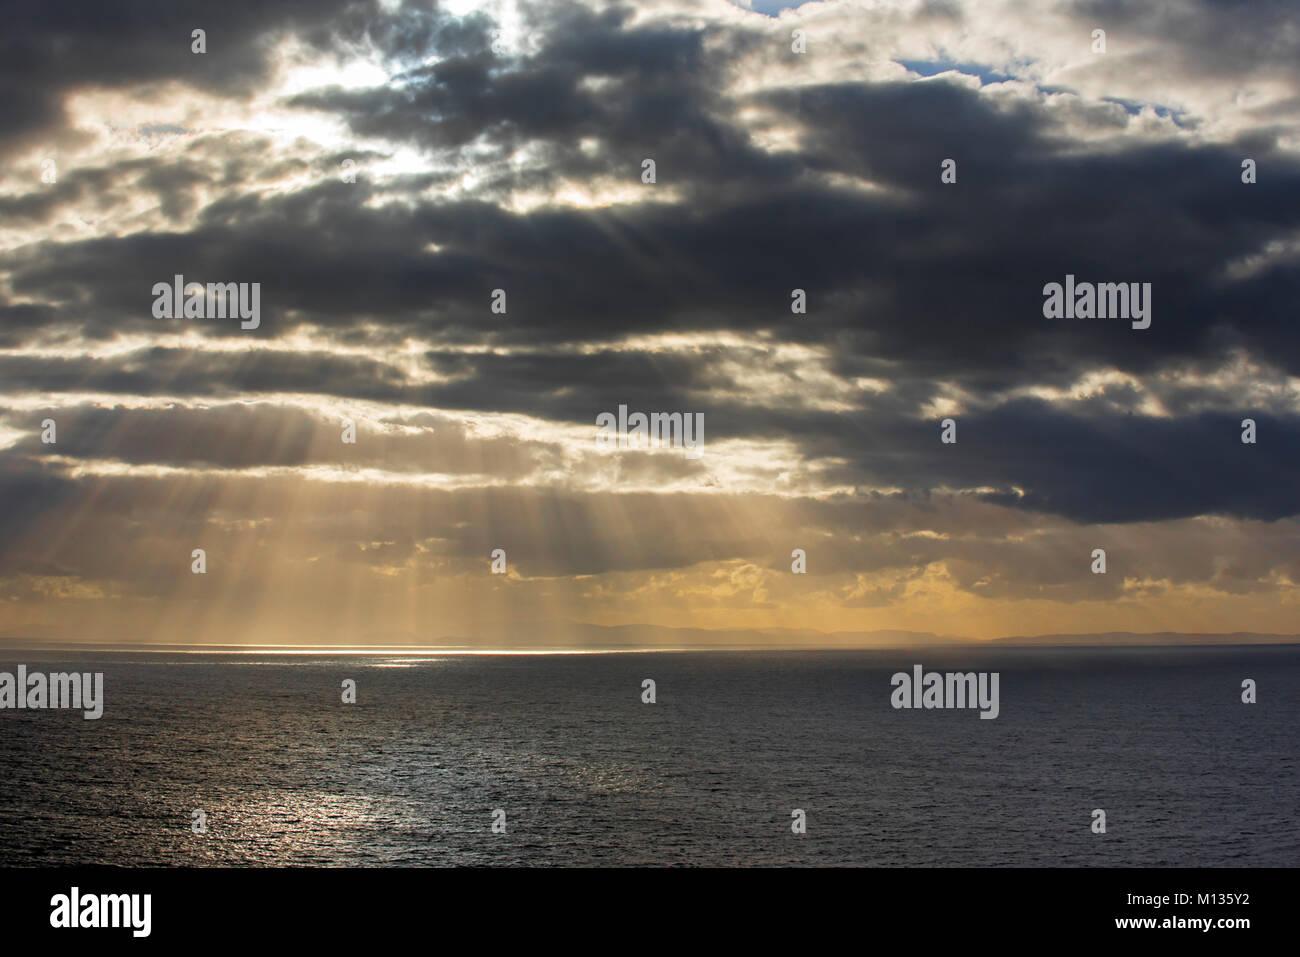 Sunrays bursting through dense sheet of rain clouds over sea water at sunset - Stock Image